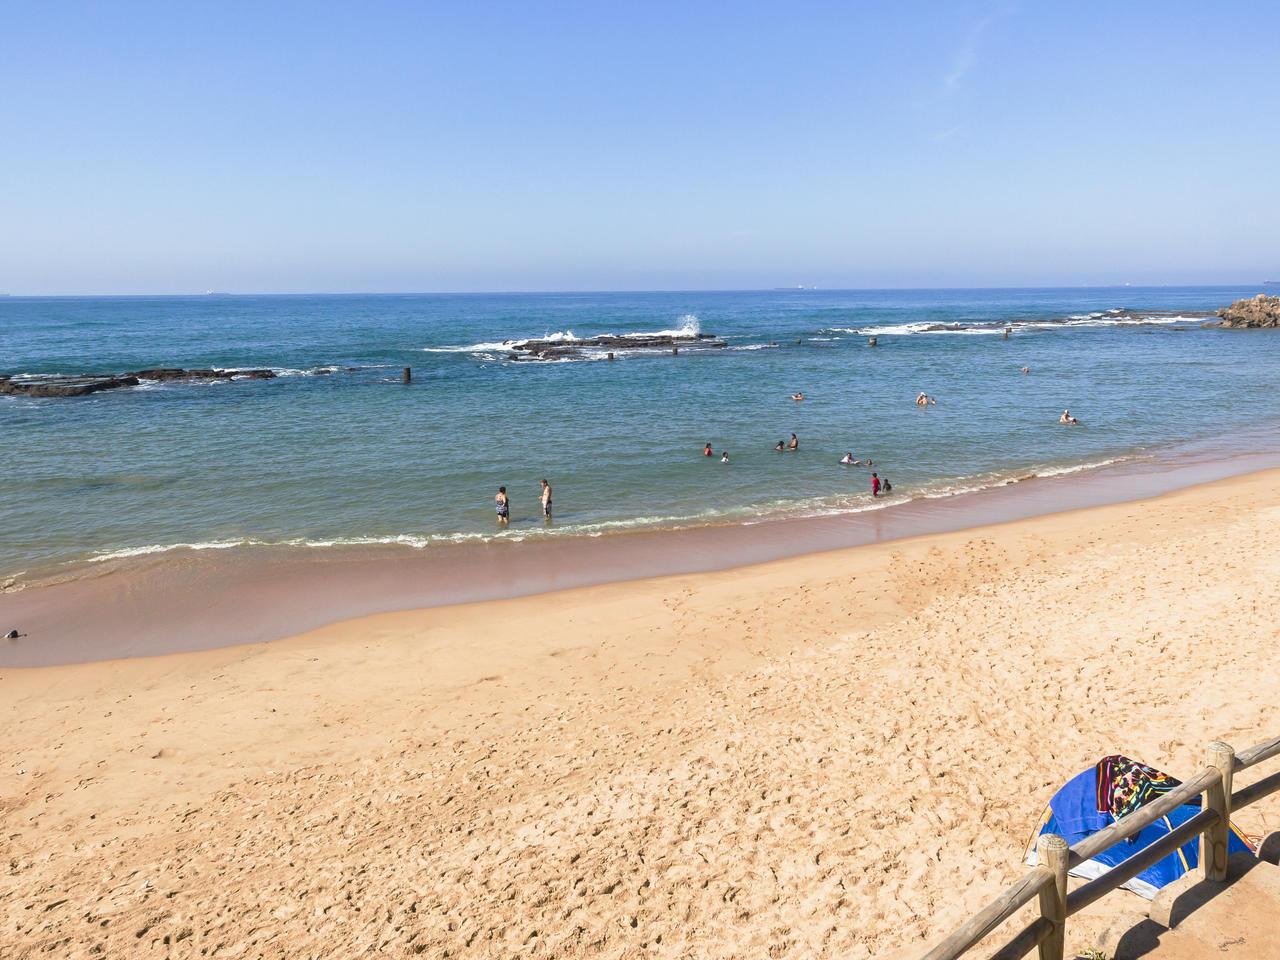 Ongerepte stranden van Umdloti